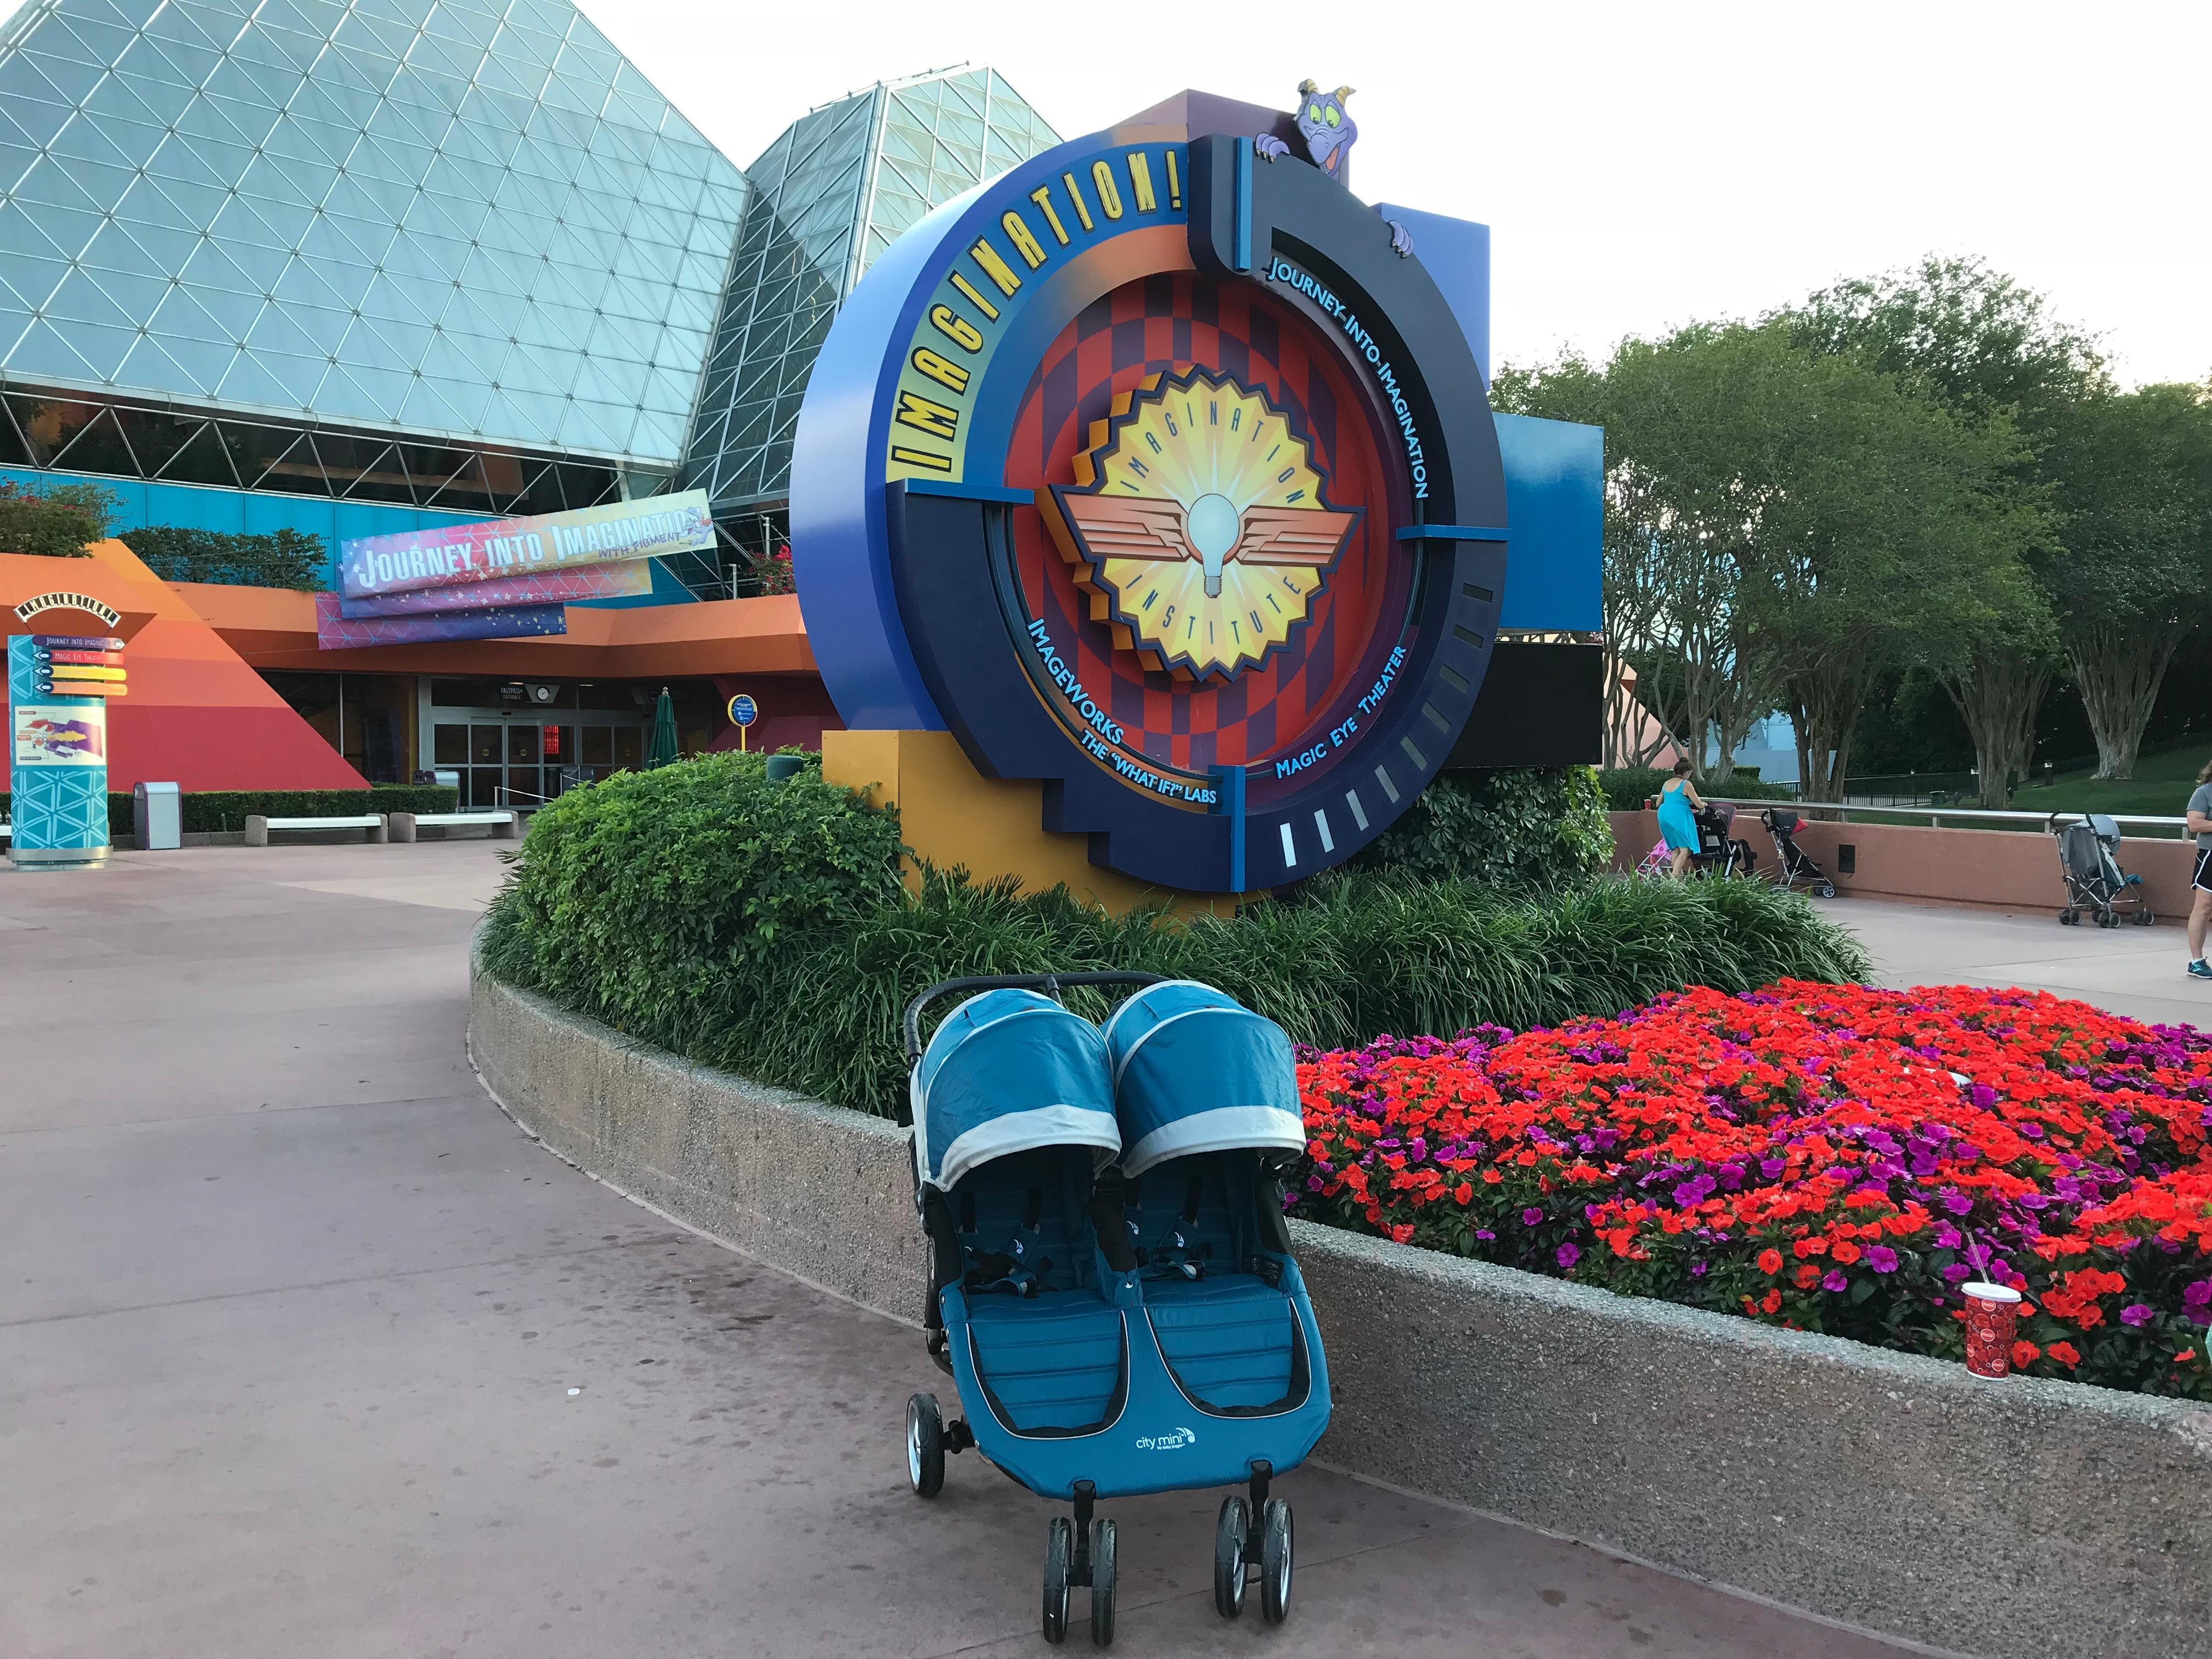 Stroller Rentals Disney image 42